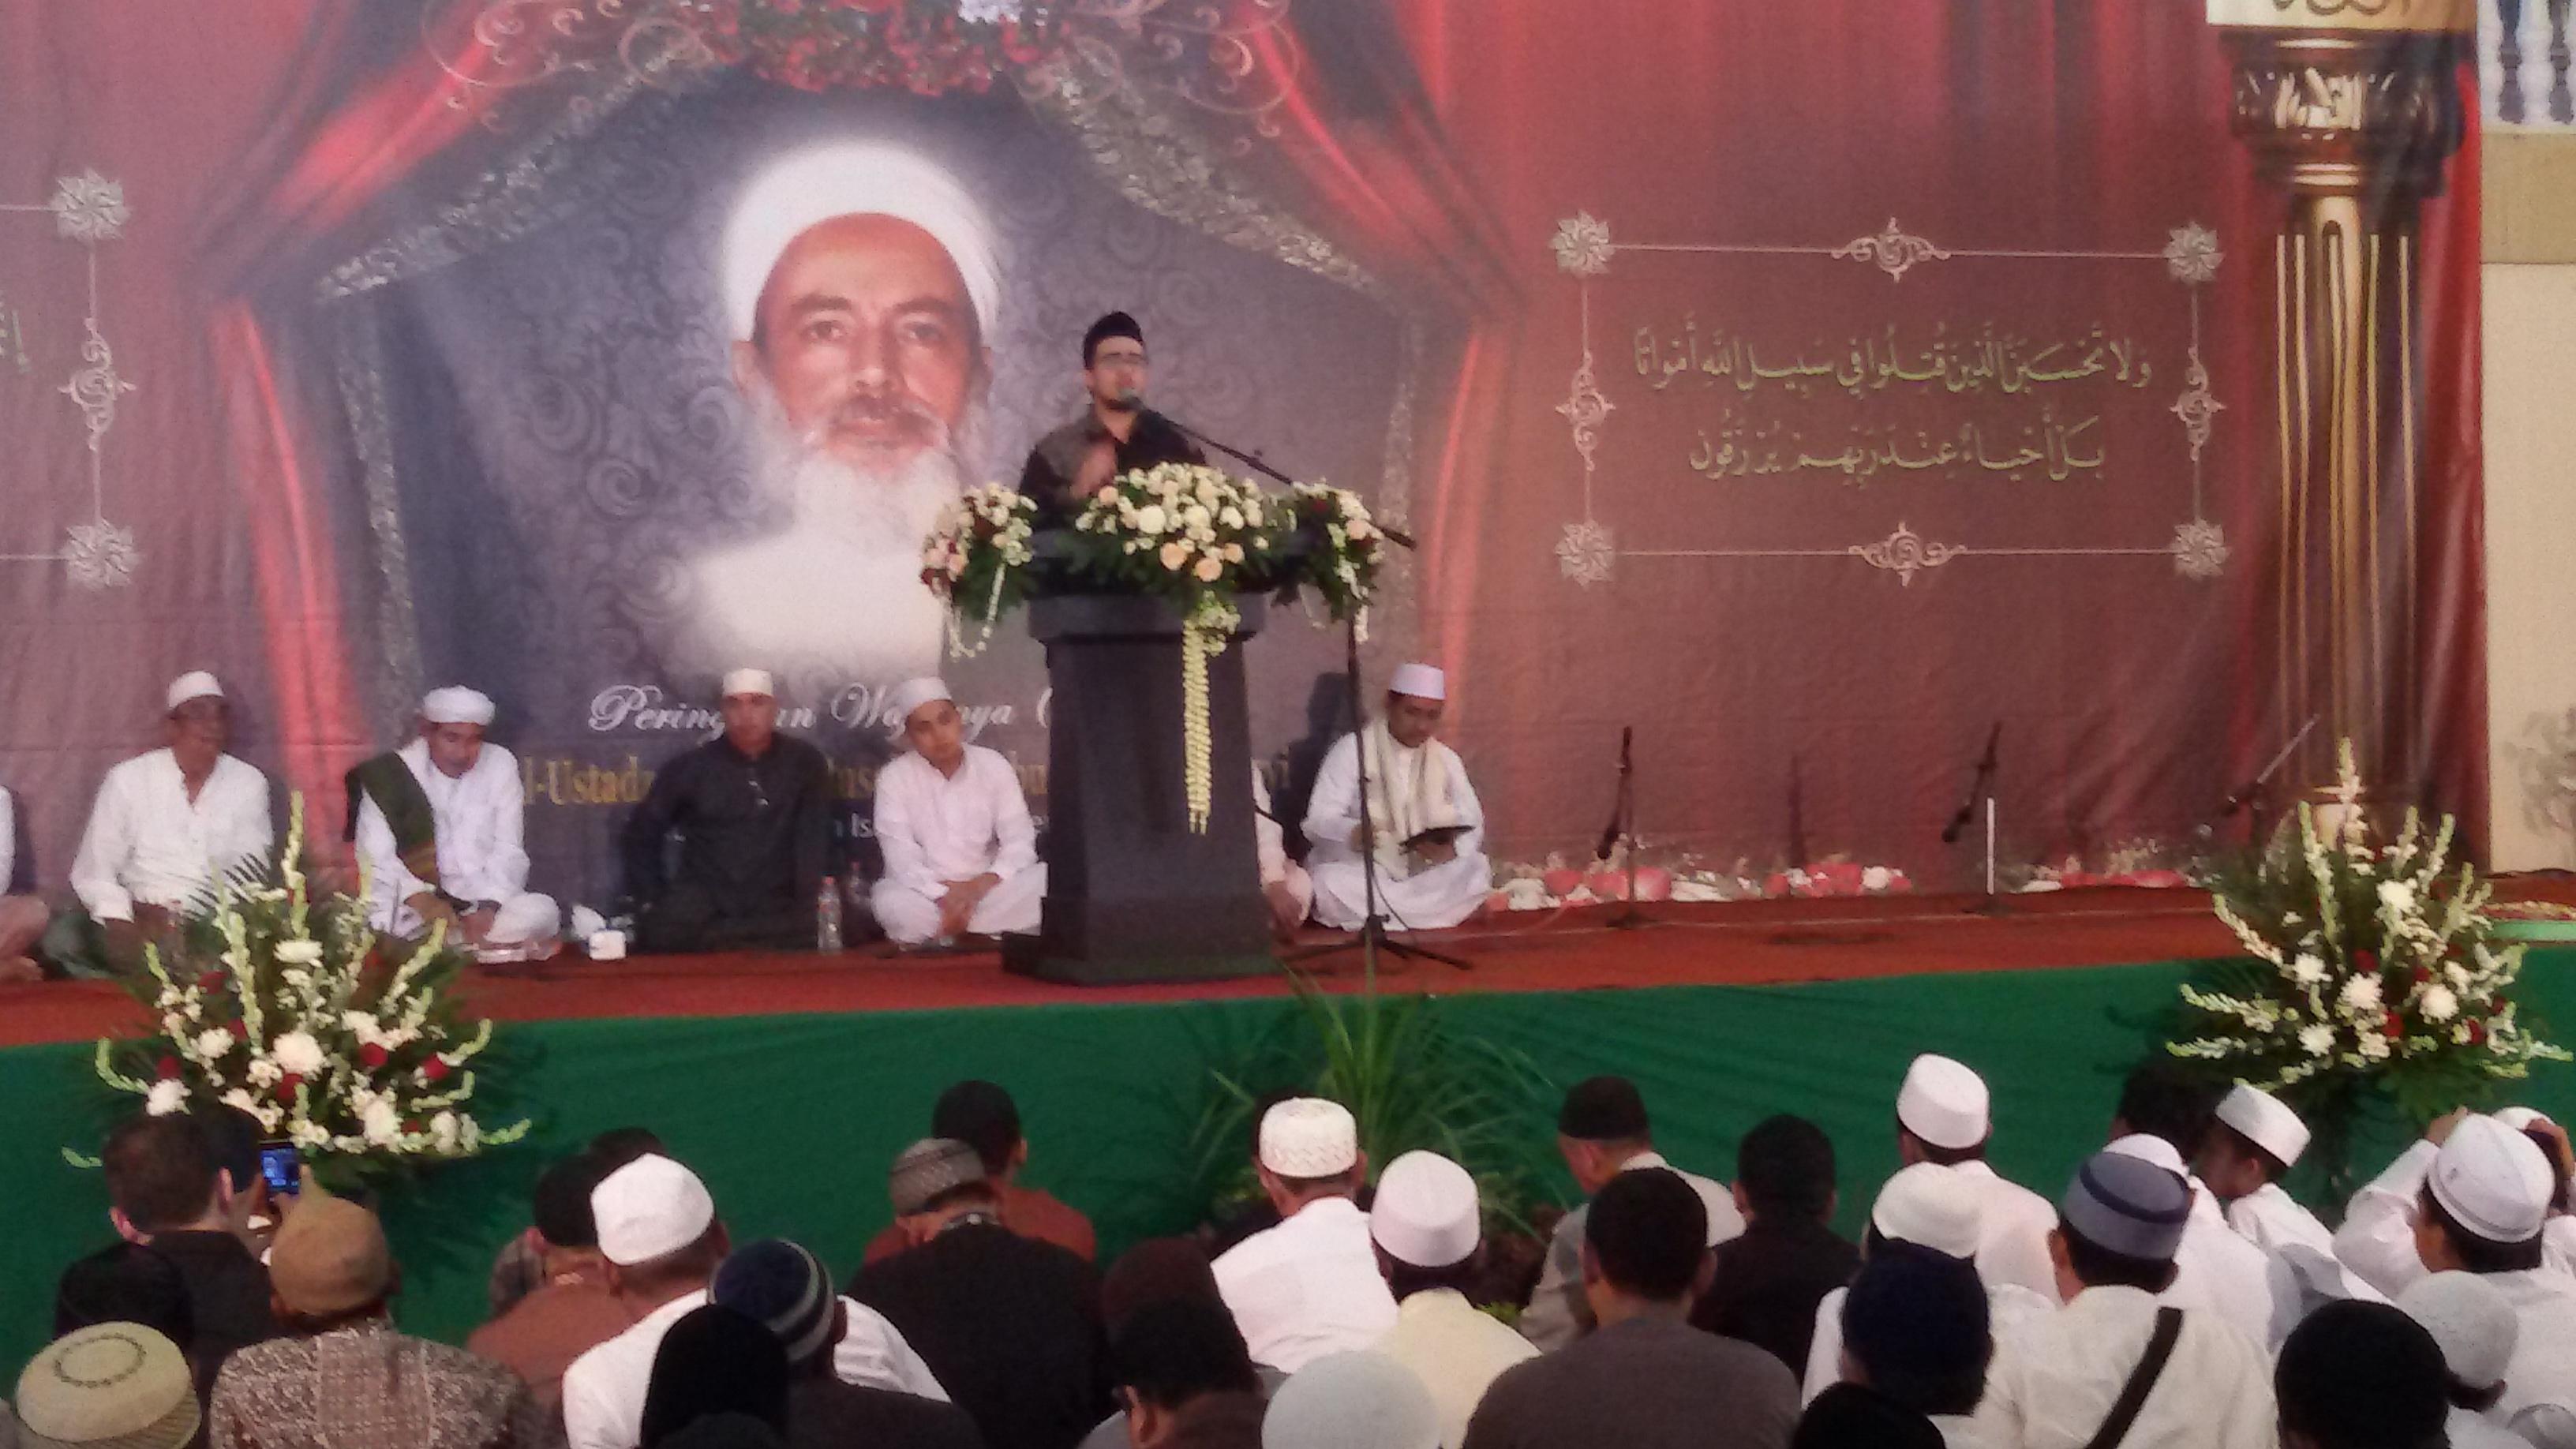 Mengenang Ustad Husein Al Habsyi: Ulama Kharismatik Teladan Ukhuwah dari Jatim